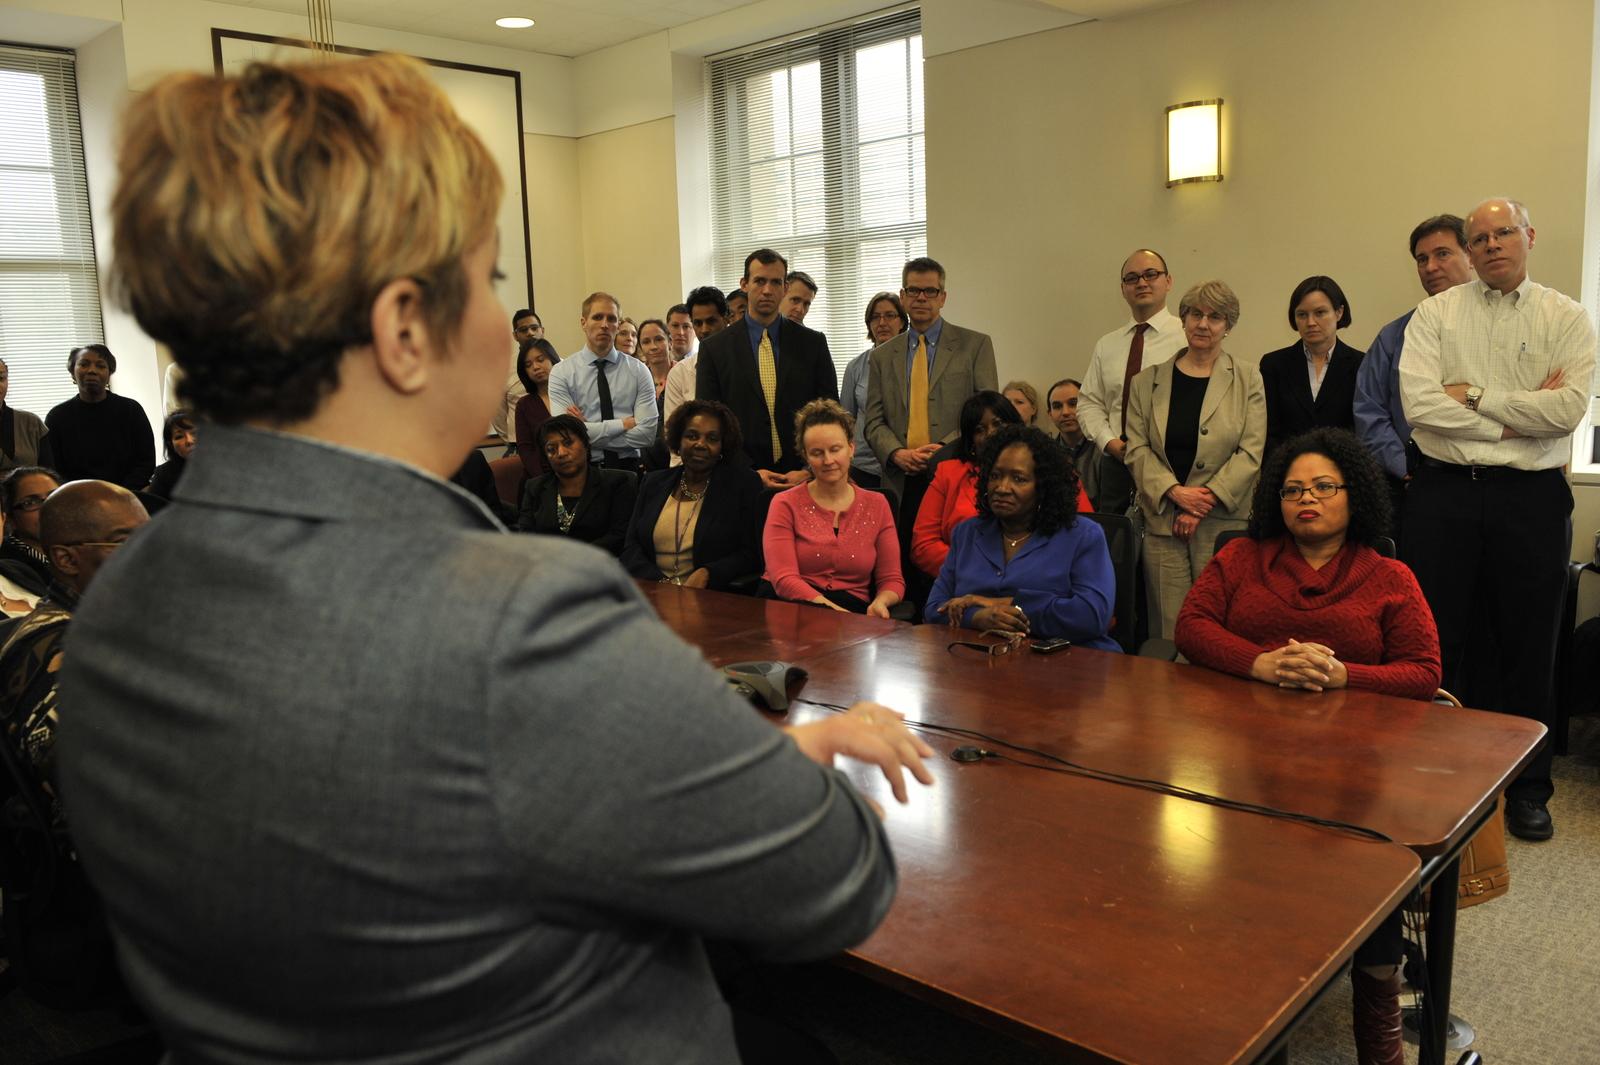 Office of the Administrator - Lisa Jackson's Farewell Tour [412-APD-1115-2013-02-07_FarewellTour_170.JPG]